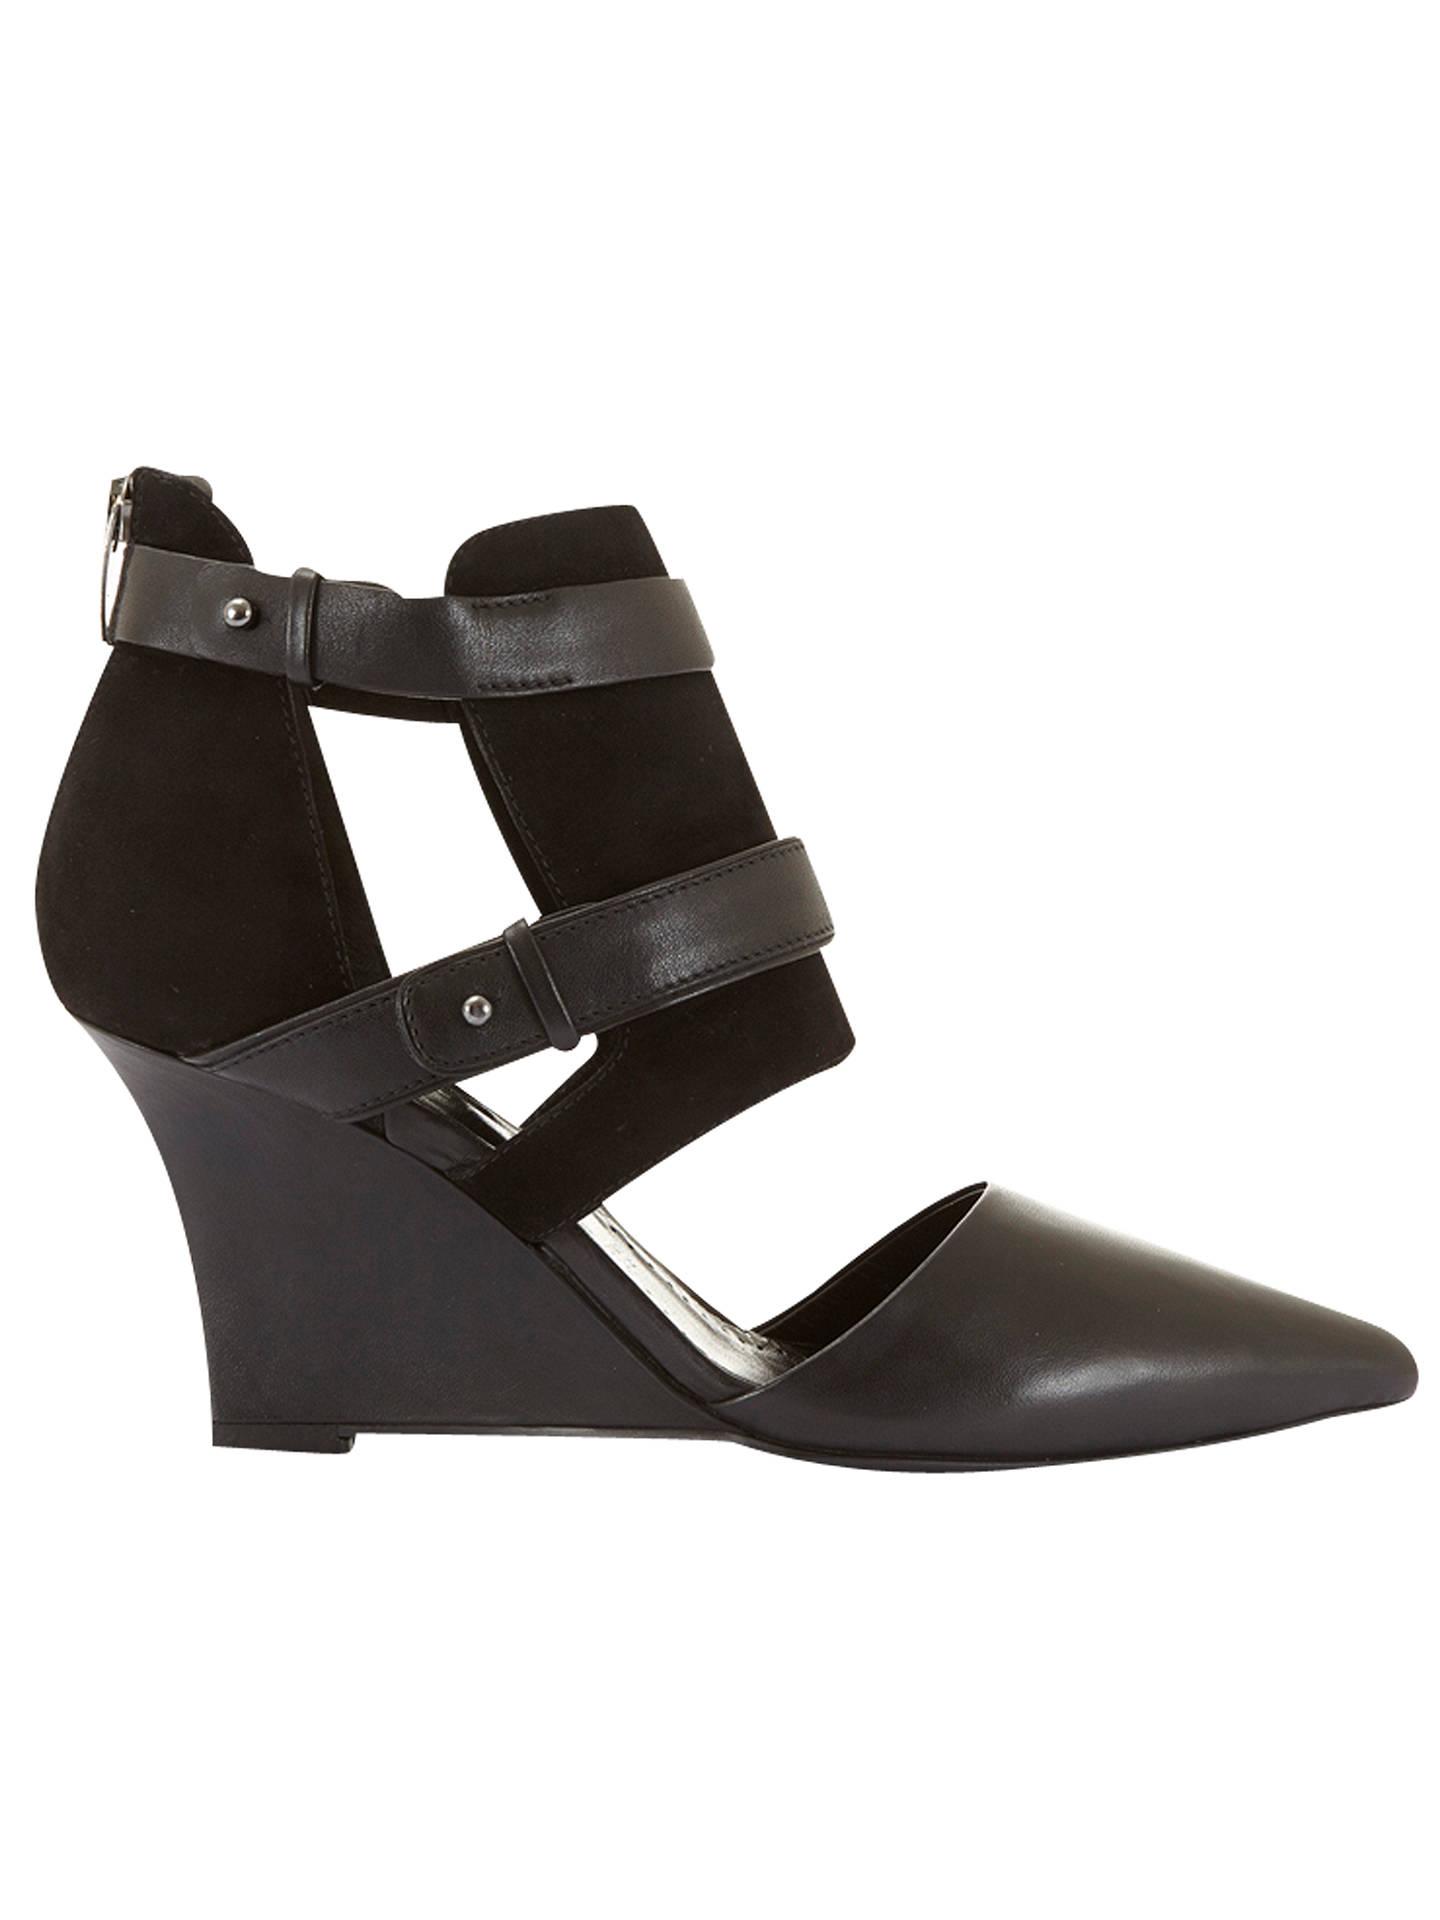 e7f889613185 Buy Mint Velvet Fergie Suede Wedge Court Shoes